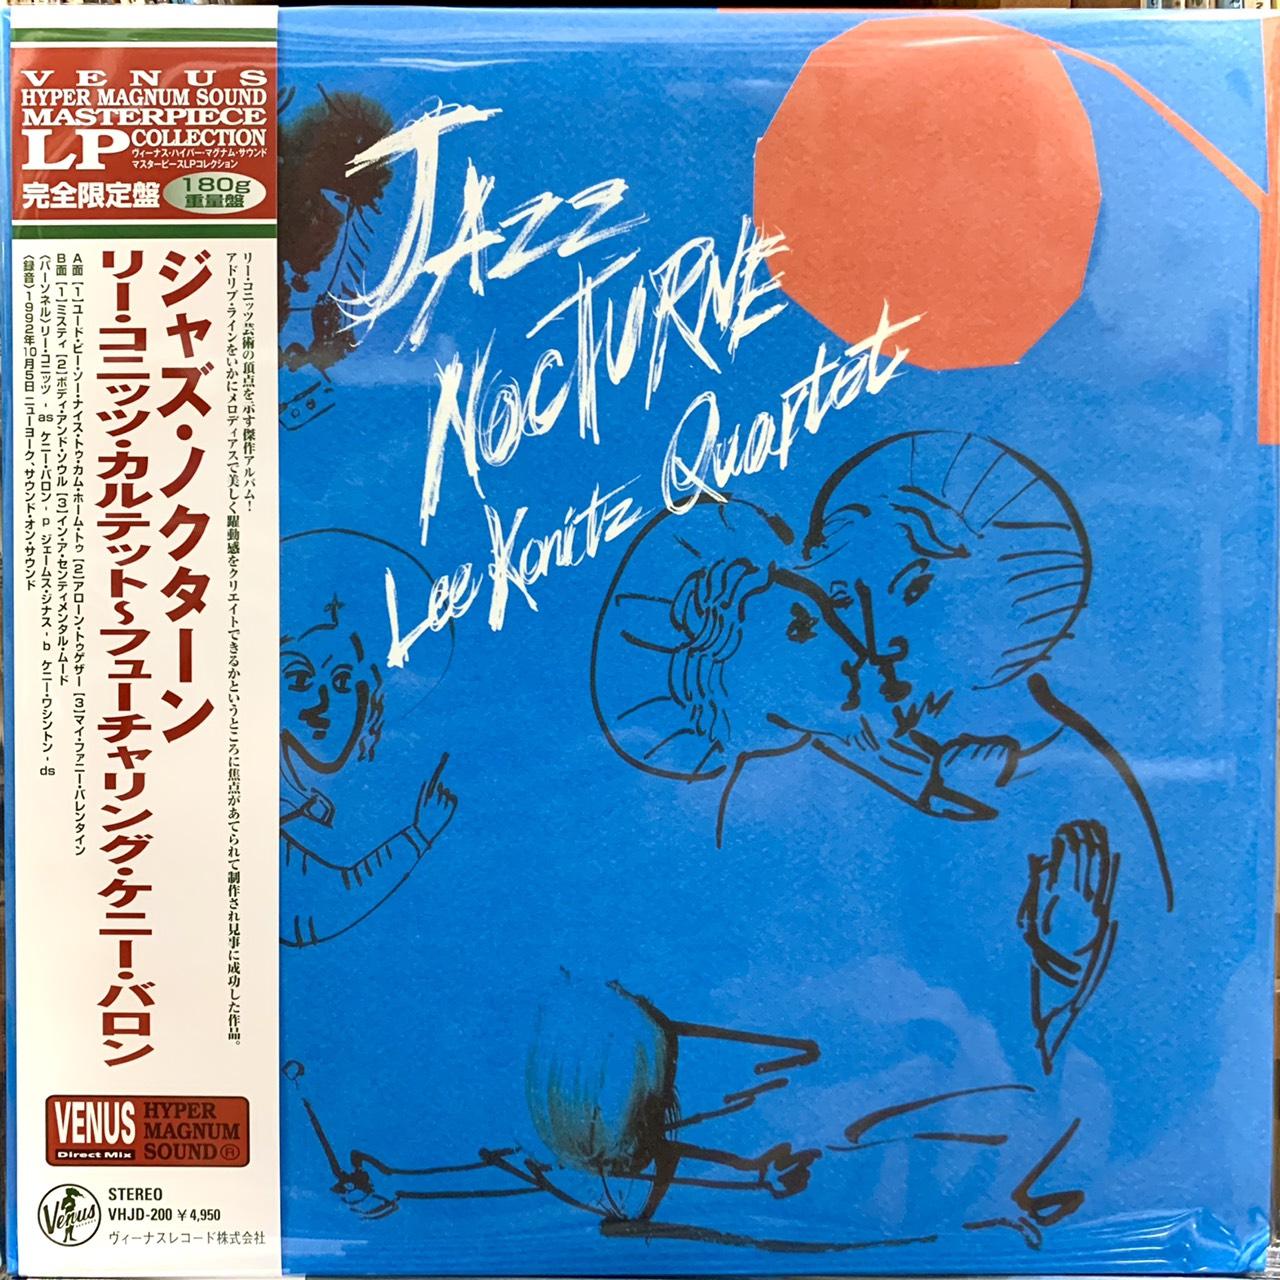 dia-than-vinyl-jazz-nocturne-lee-konitz-quartet